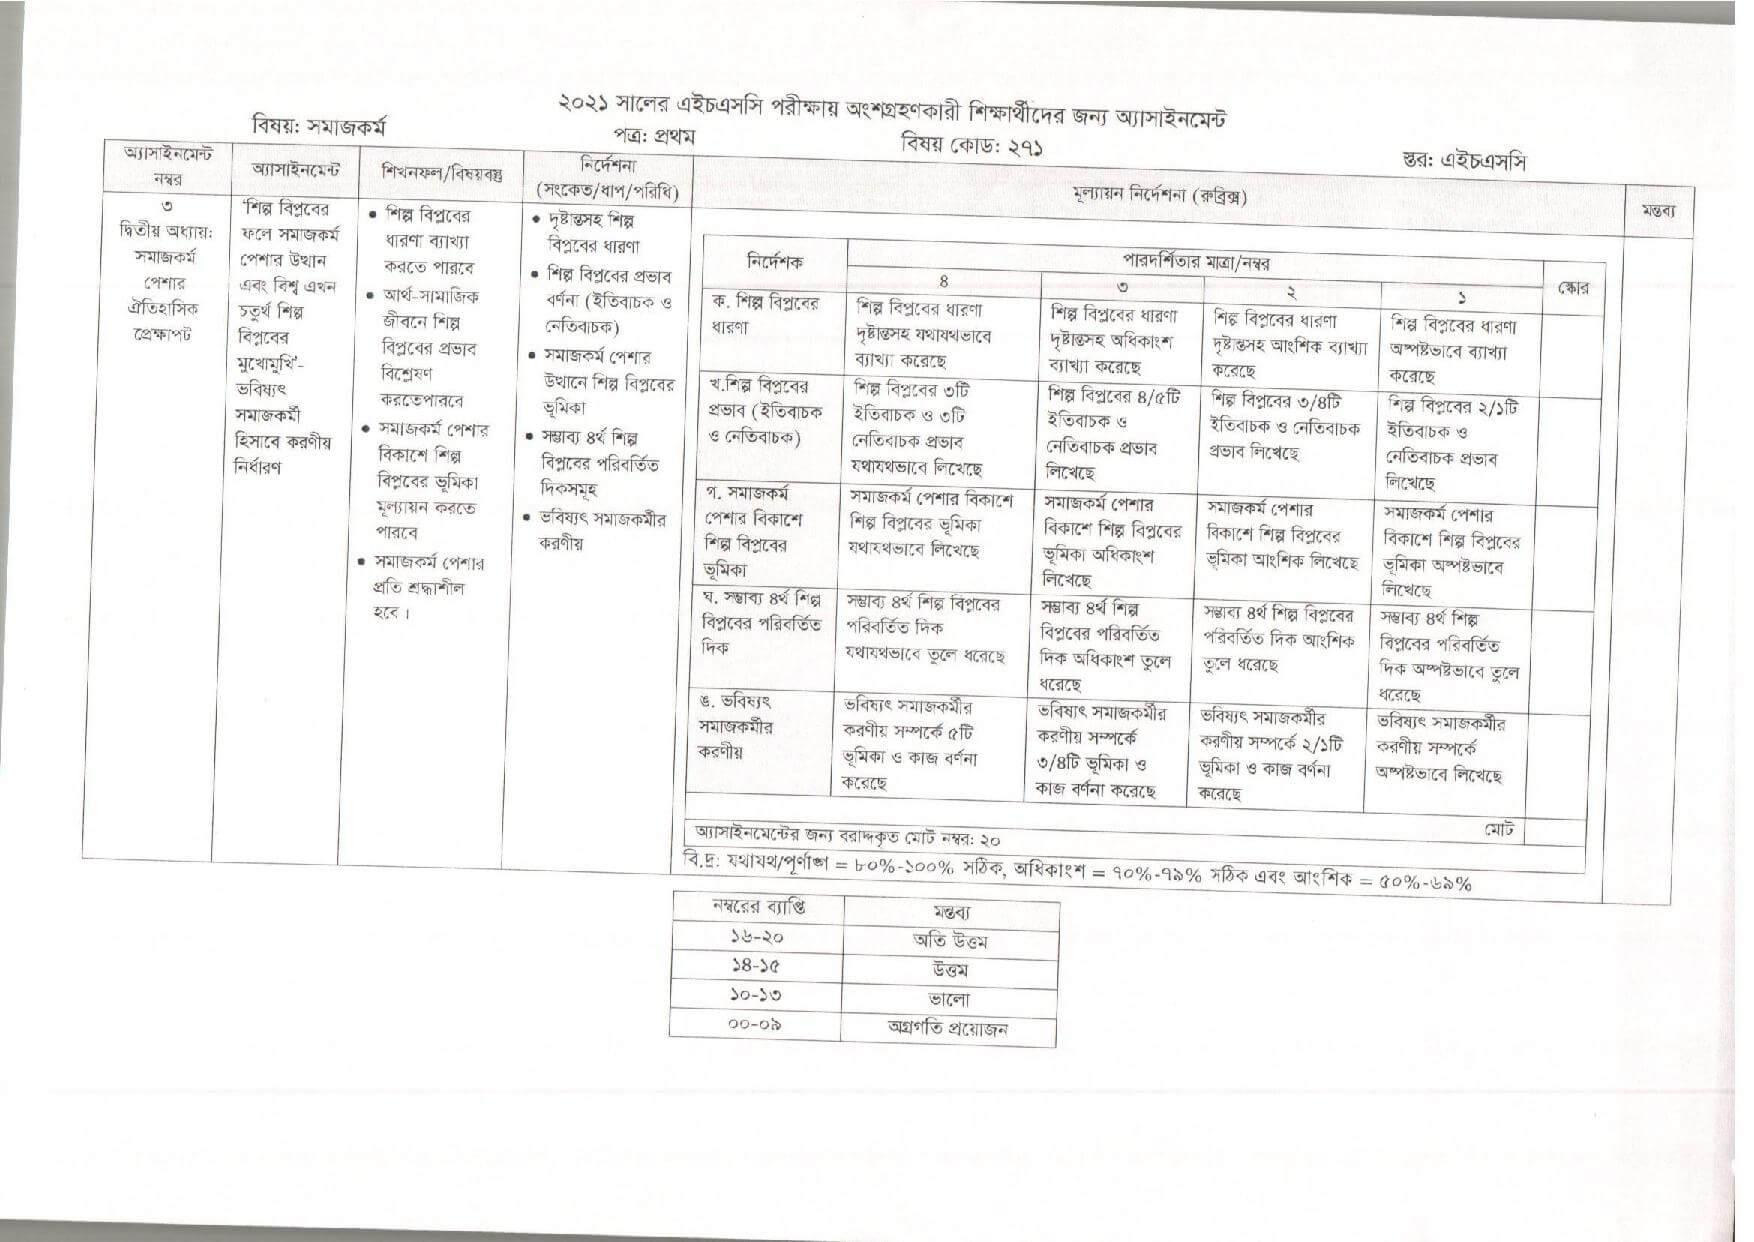 HSC Social Work Assignment Answer 2021 5th Week